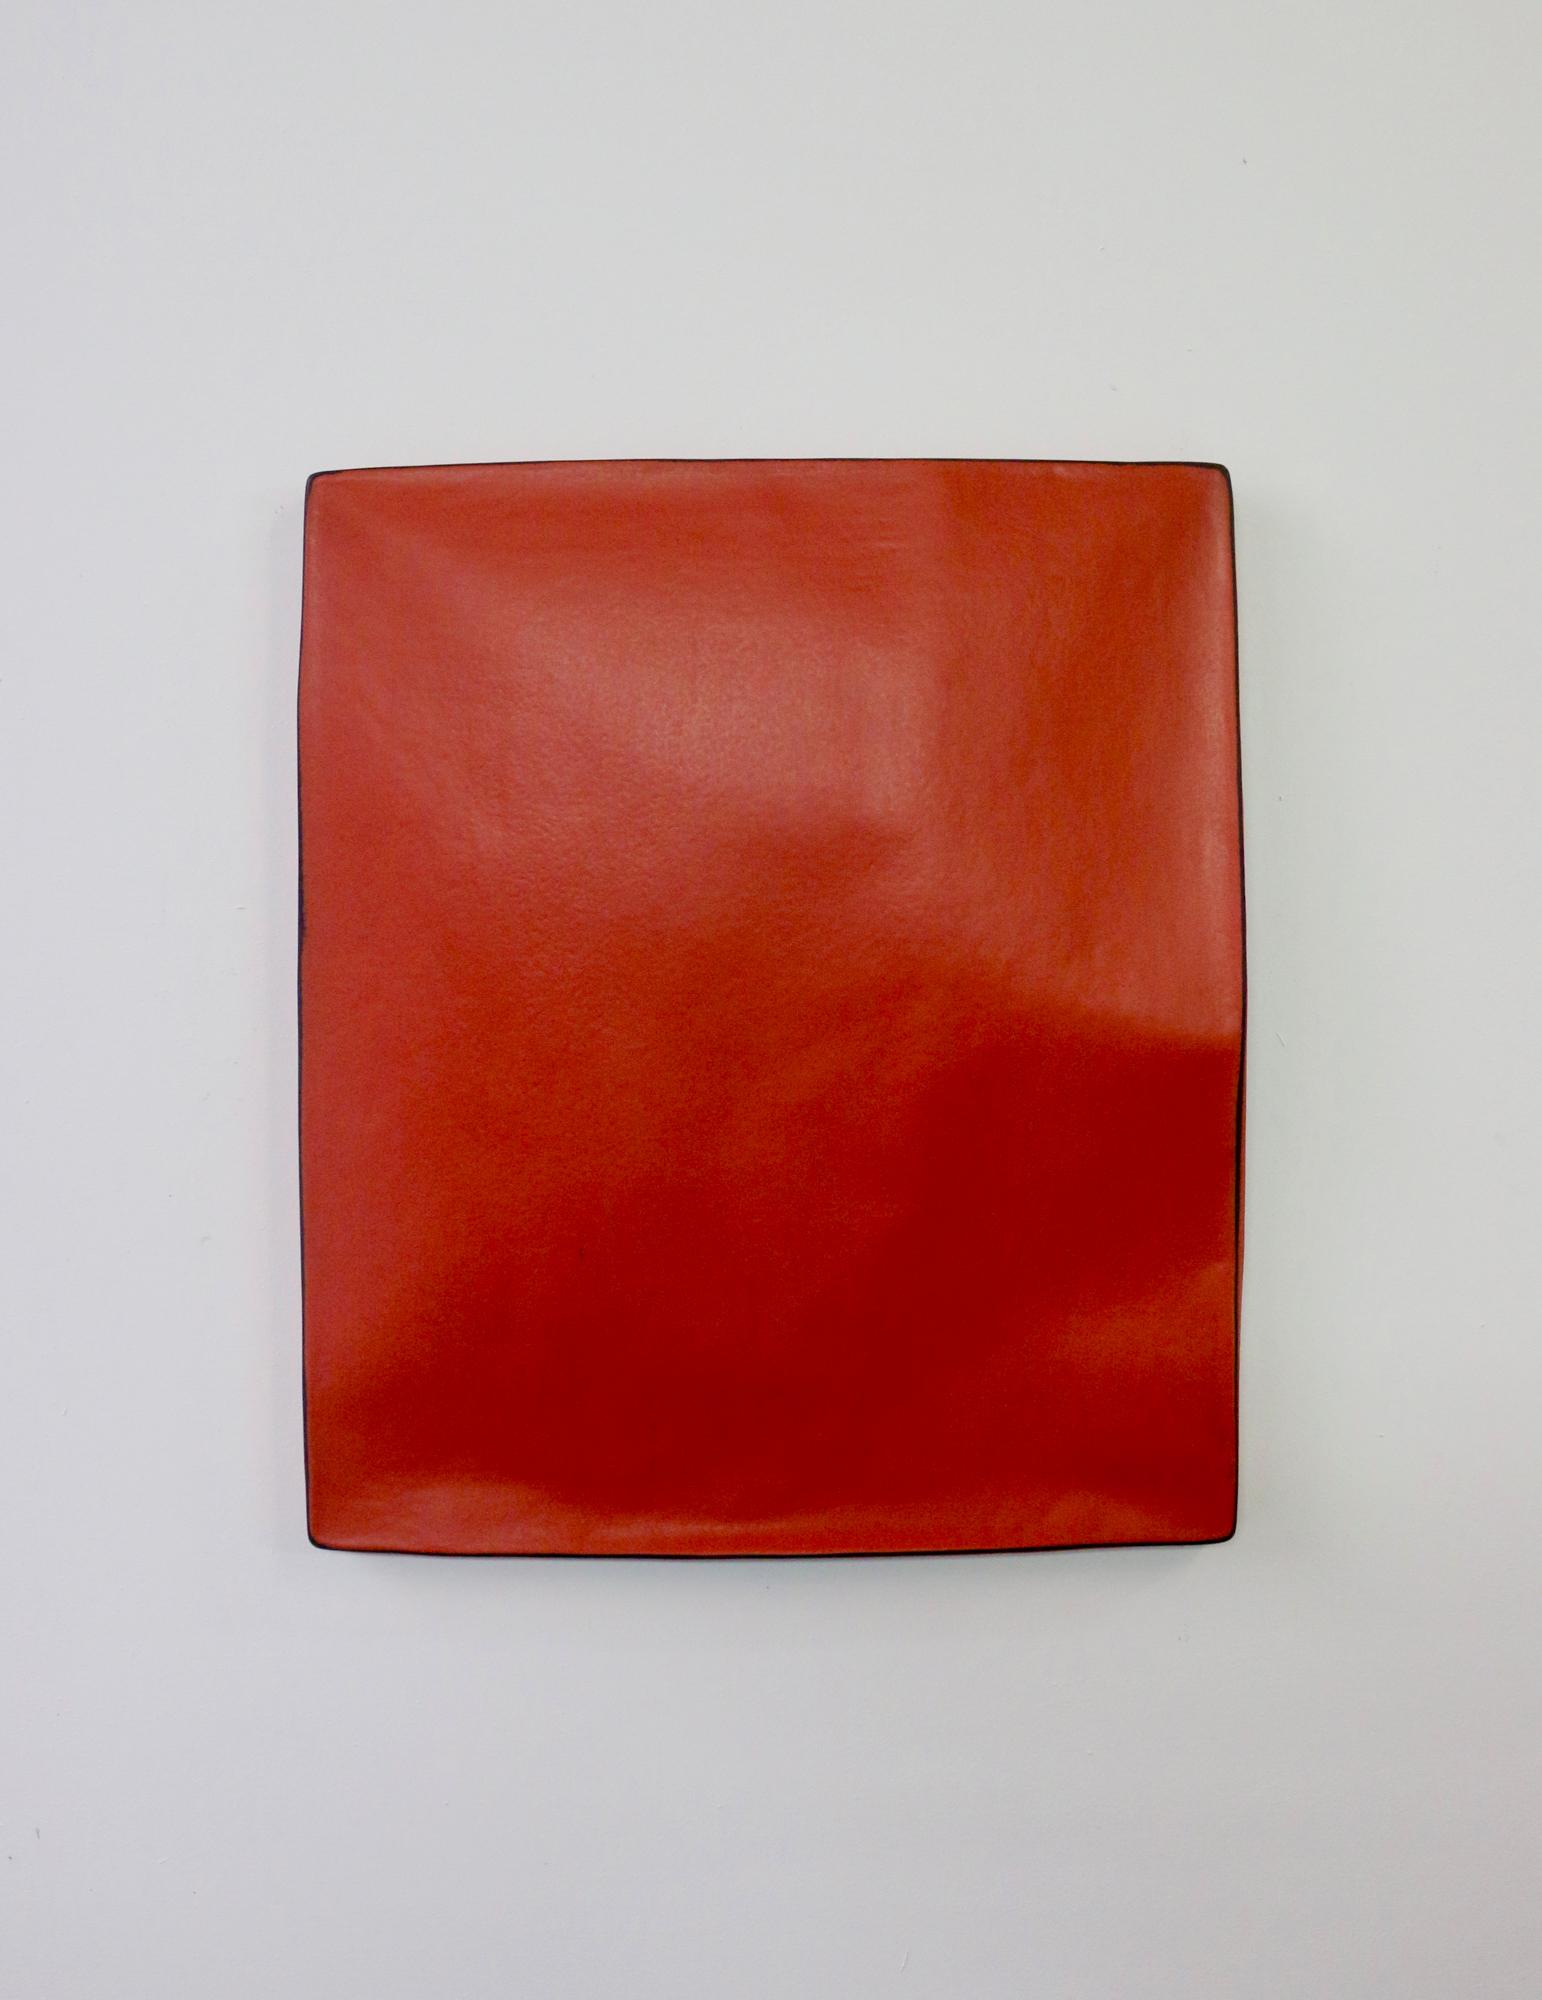 Johan De Wit, Untitled, 2018, Paper, Resin, Marble, Acrylic, 45 x 38.5 x 3.5 cm, Affinity Art